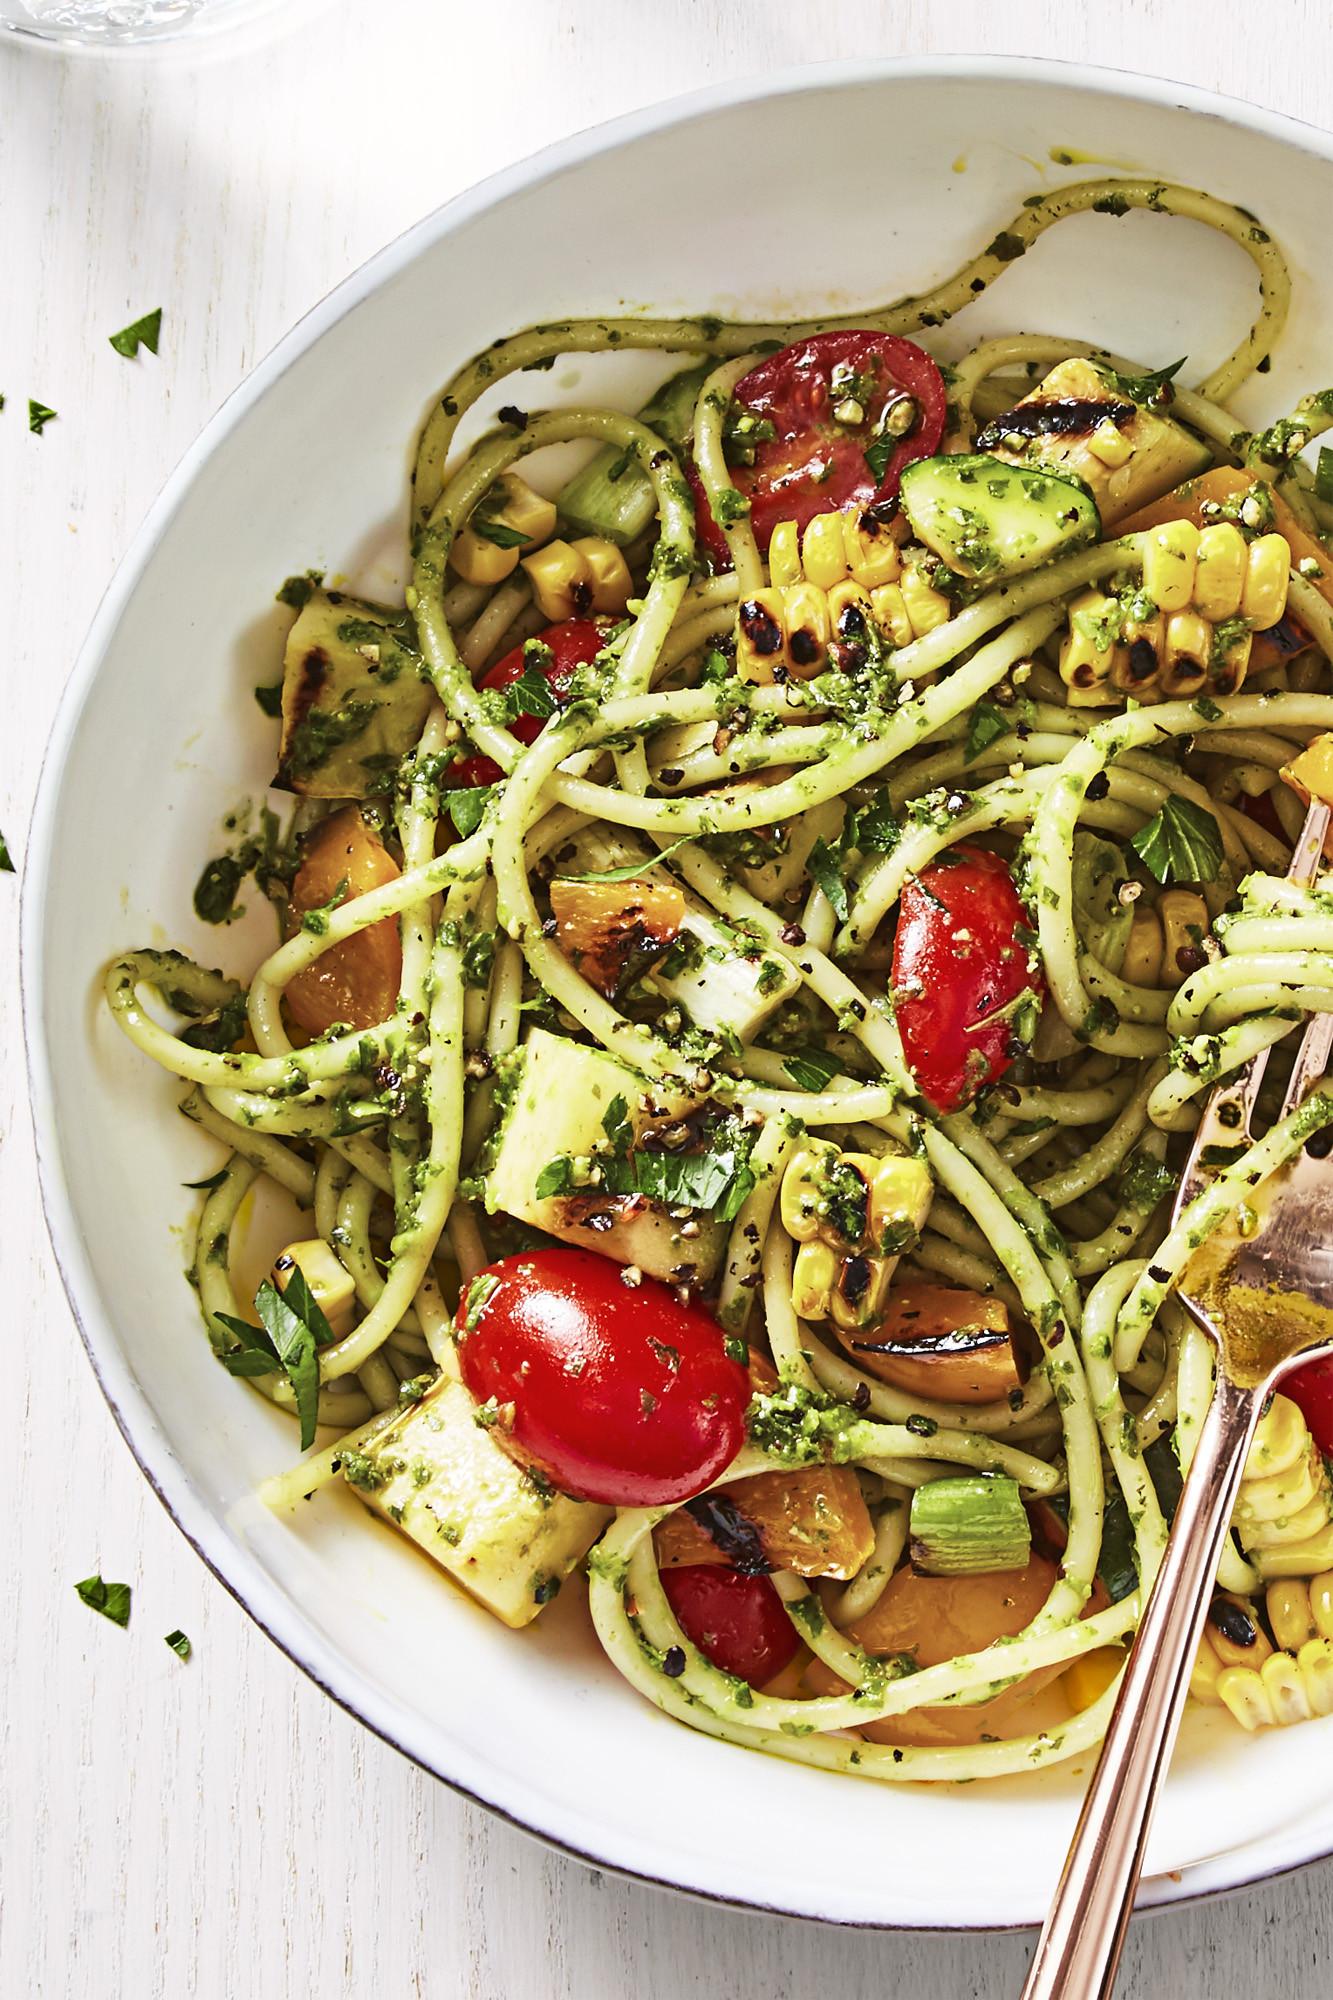 Easy Healthy Vegetarian Recipes  Best Summer Pesto Pasta Recipe How to Make Summer Pesto